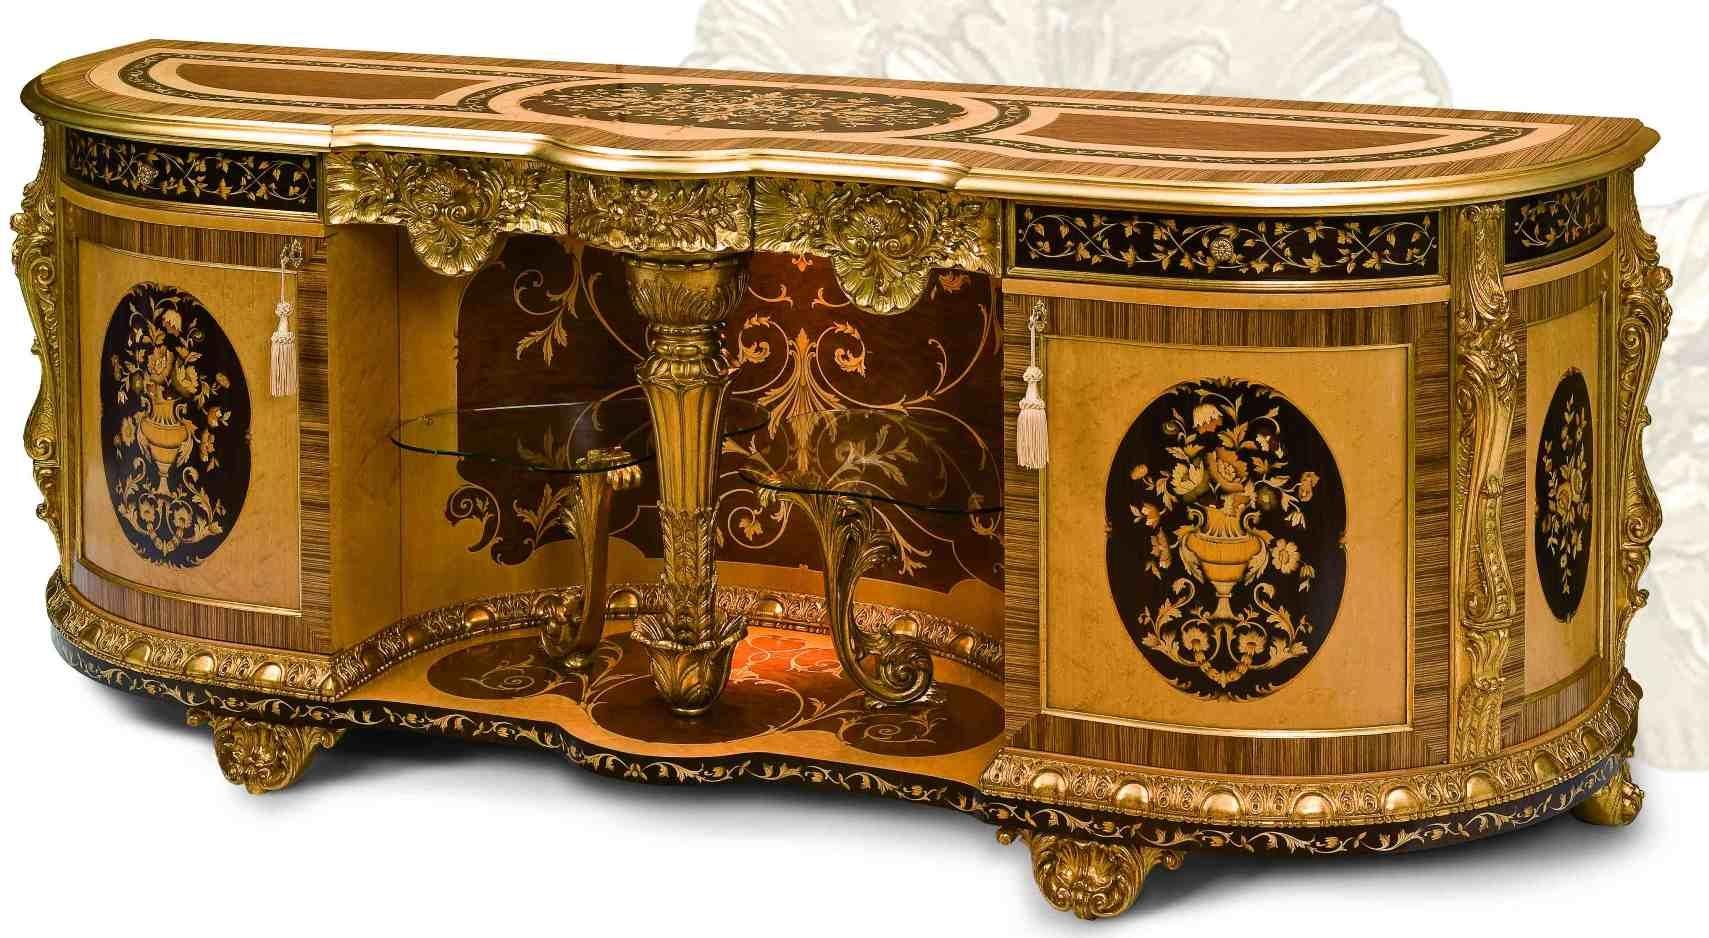 11 Luxury furniture  Exquisite Empire style dining Breakfront. Luxury furniture  Exquisite Empire style dining Breakfront